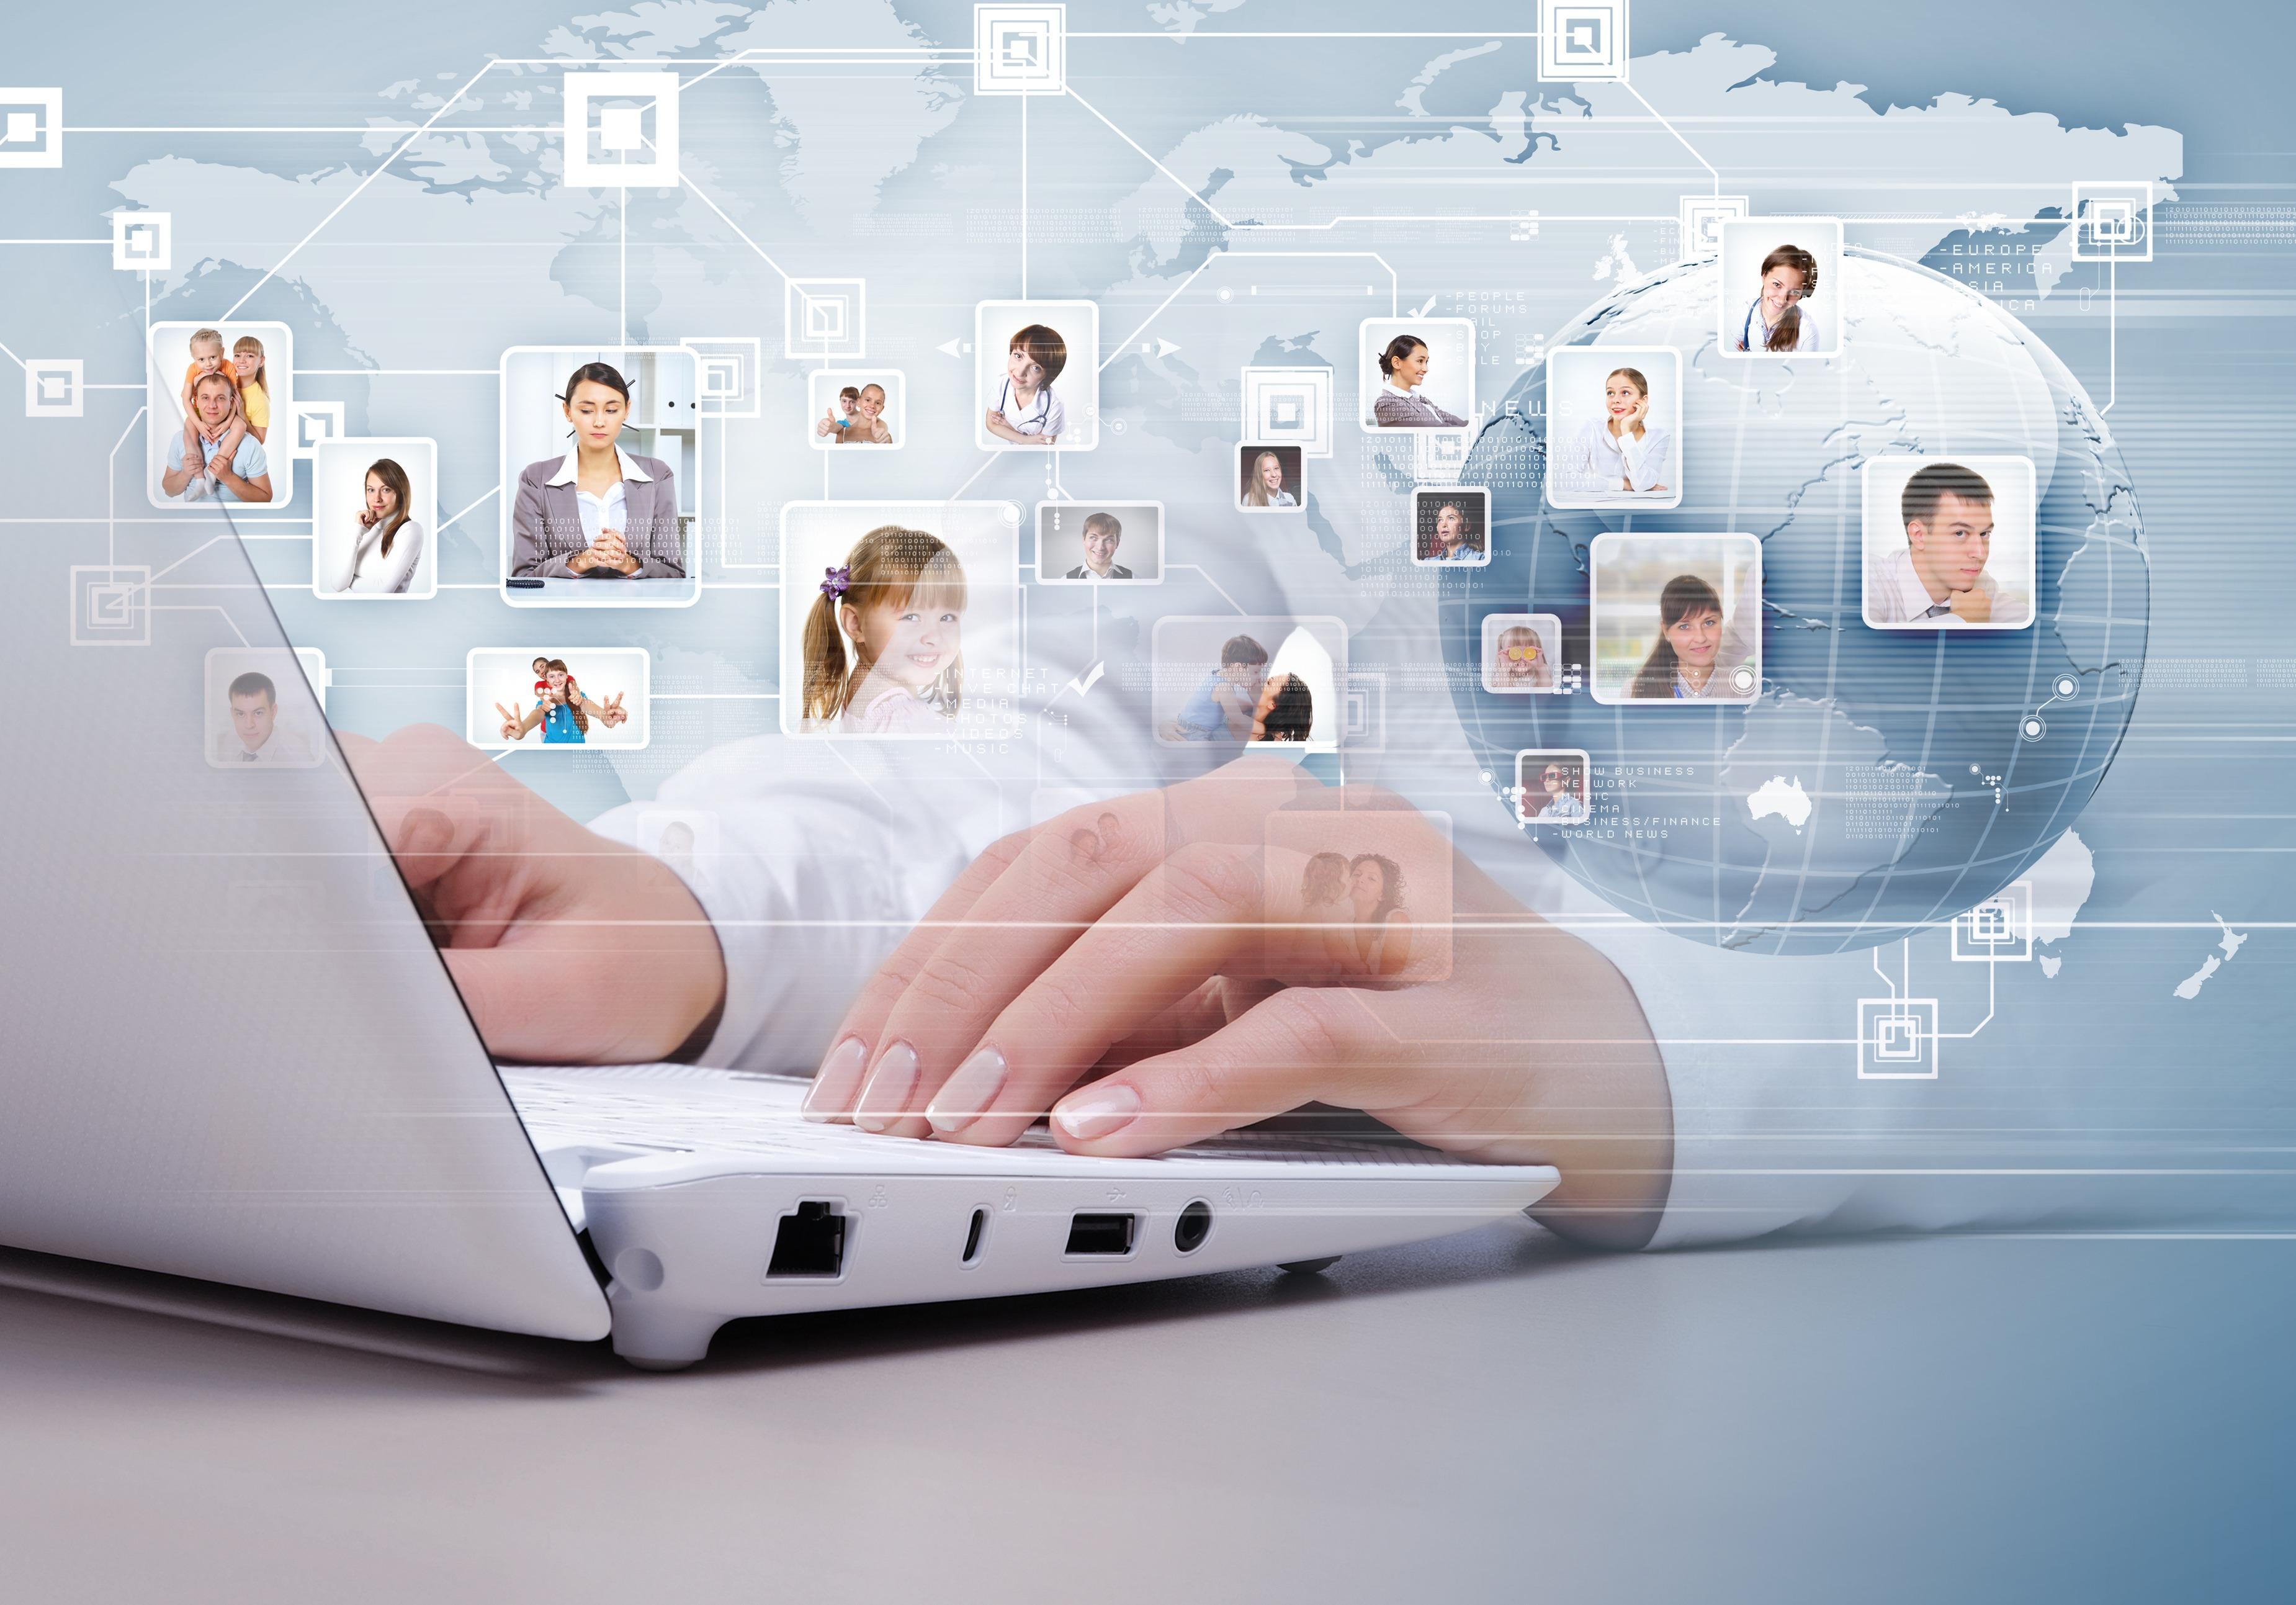 online evidnece social Media investigations - hodson pi